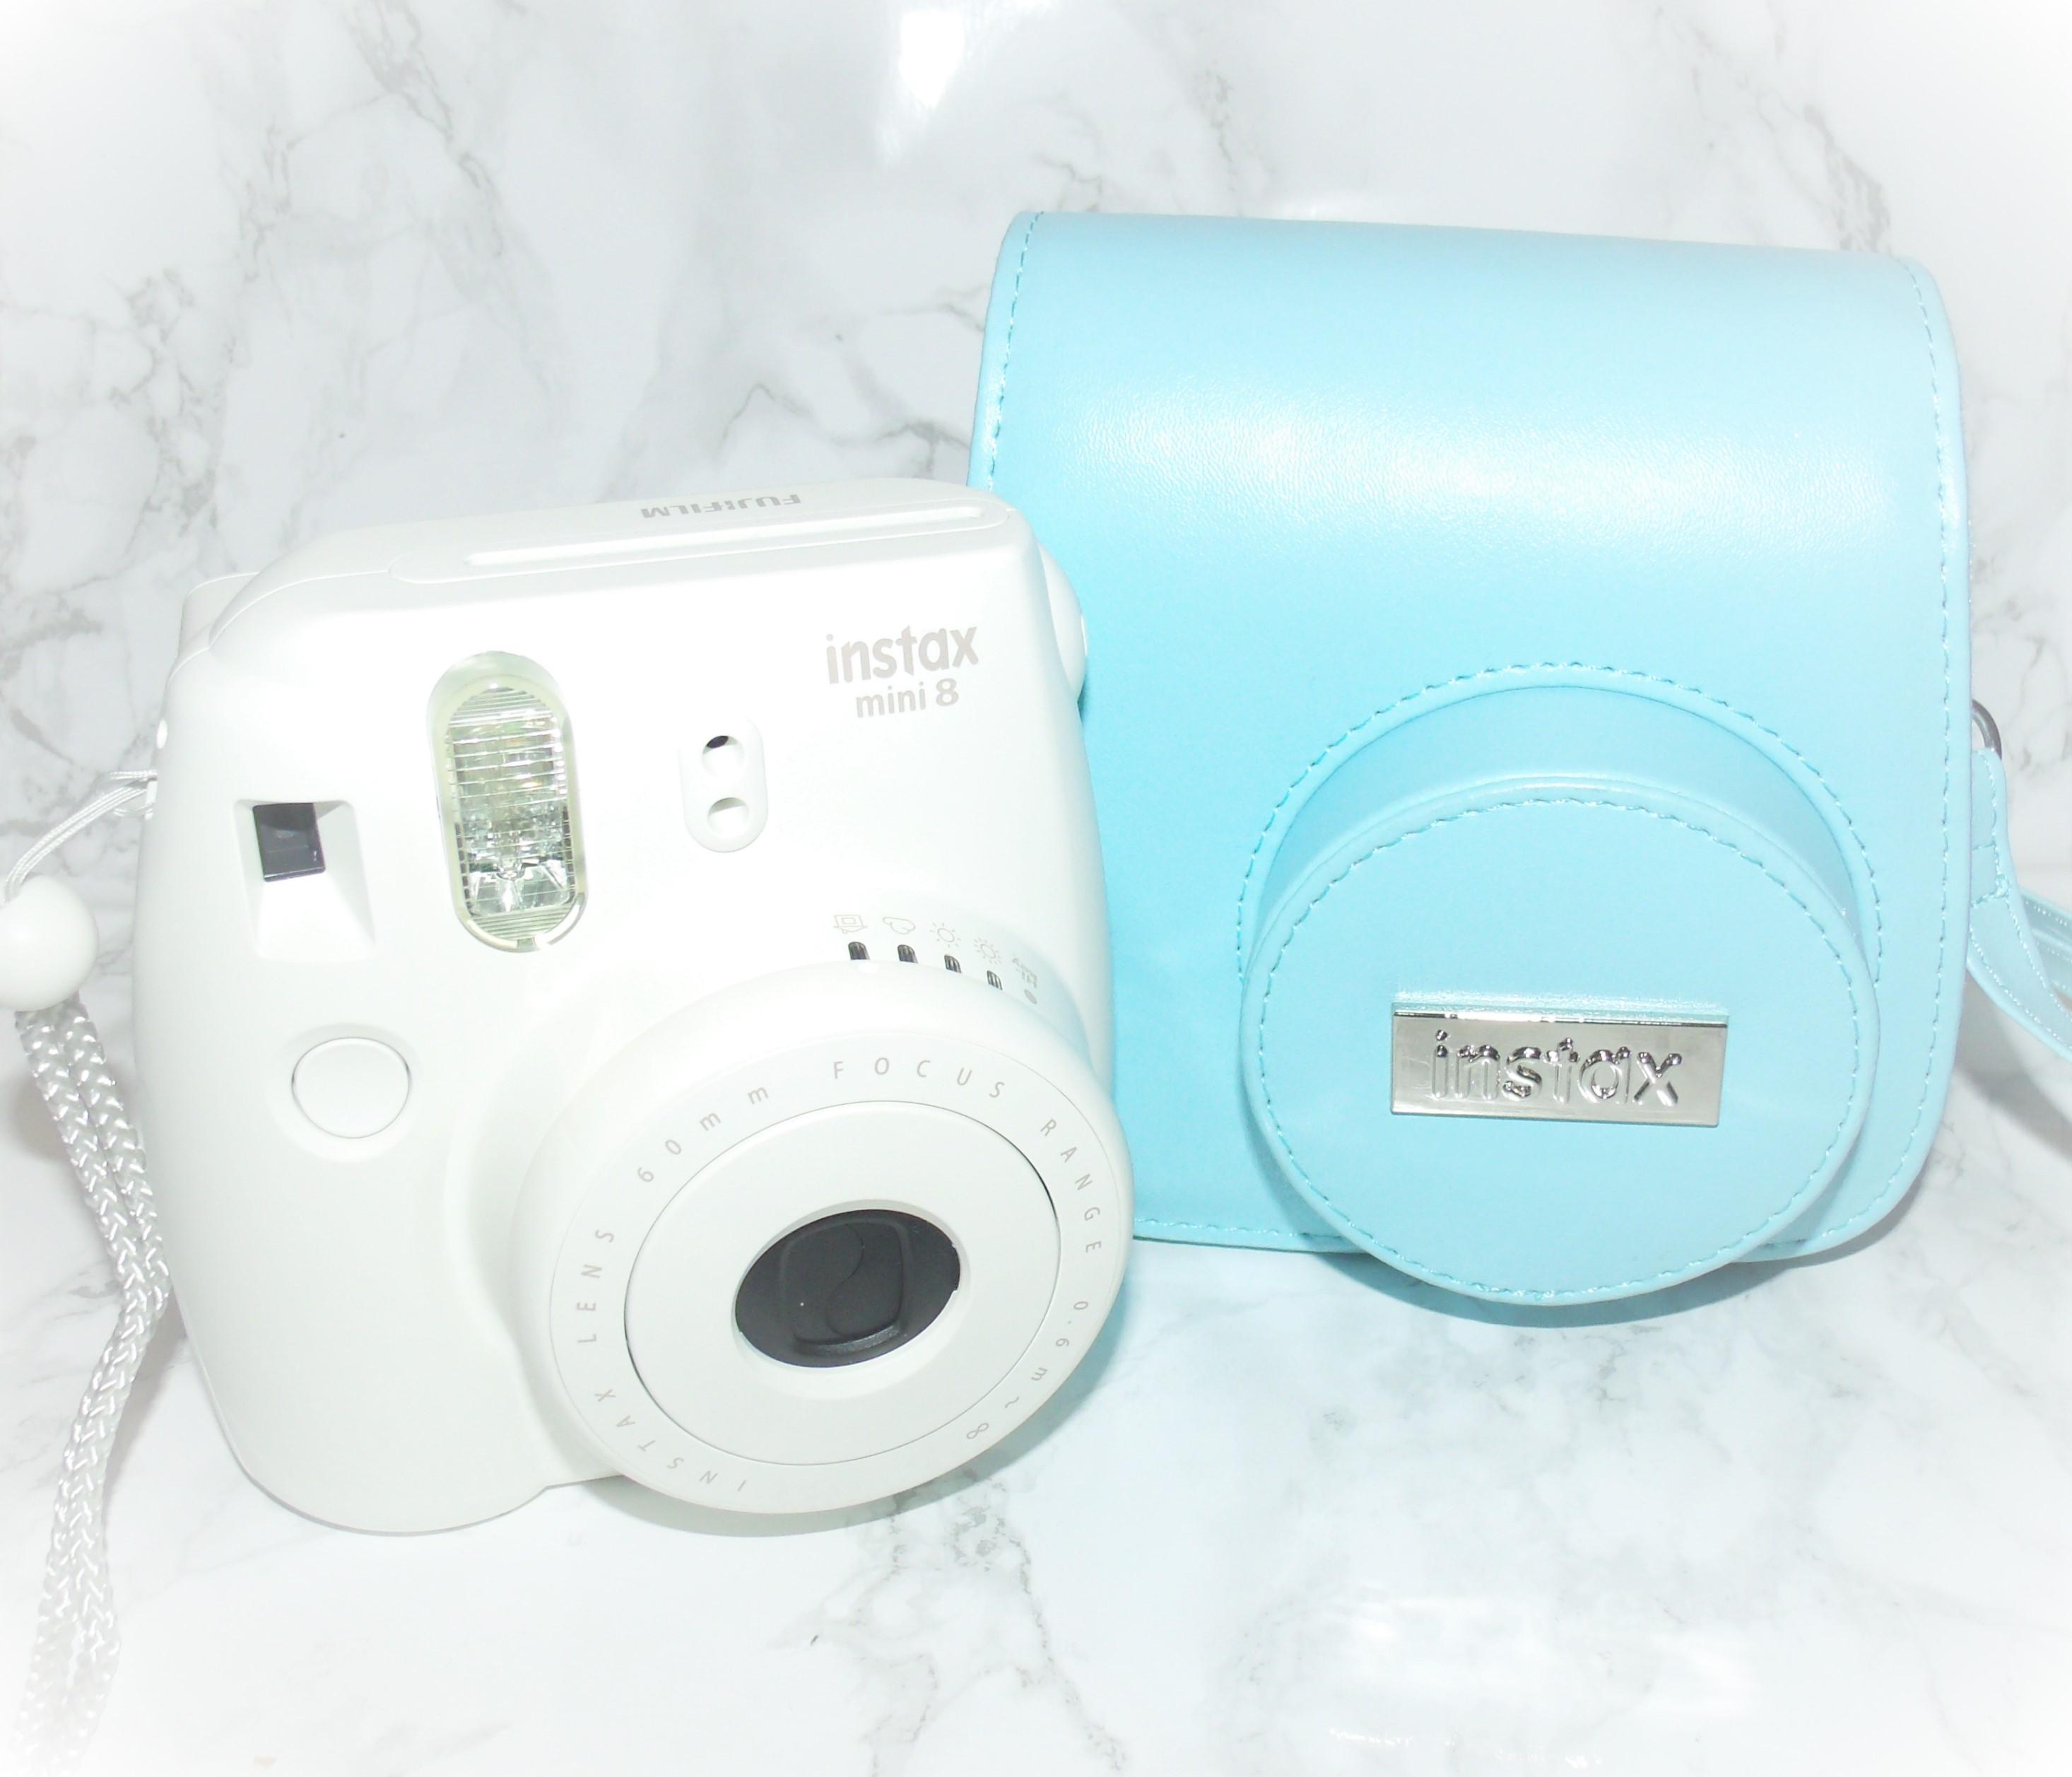 Fujifilm Instax Mini 8 White with Blue Case